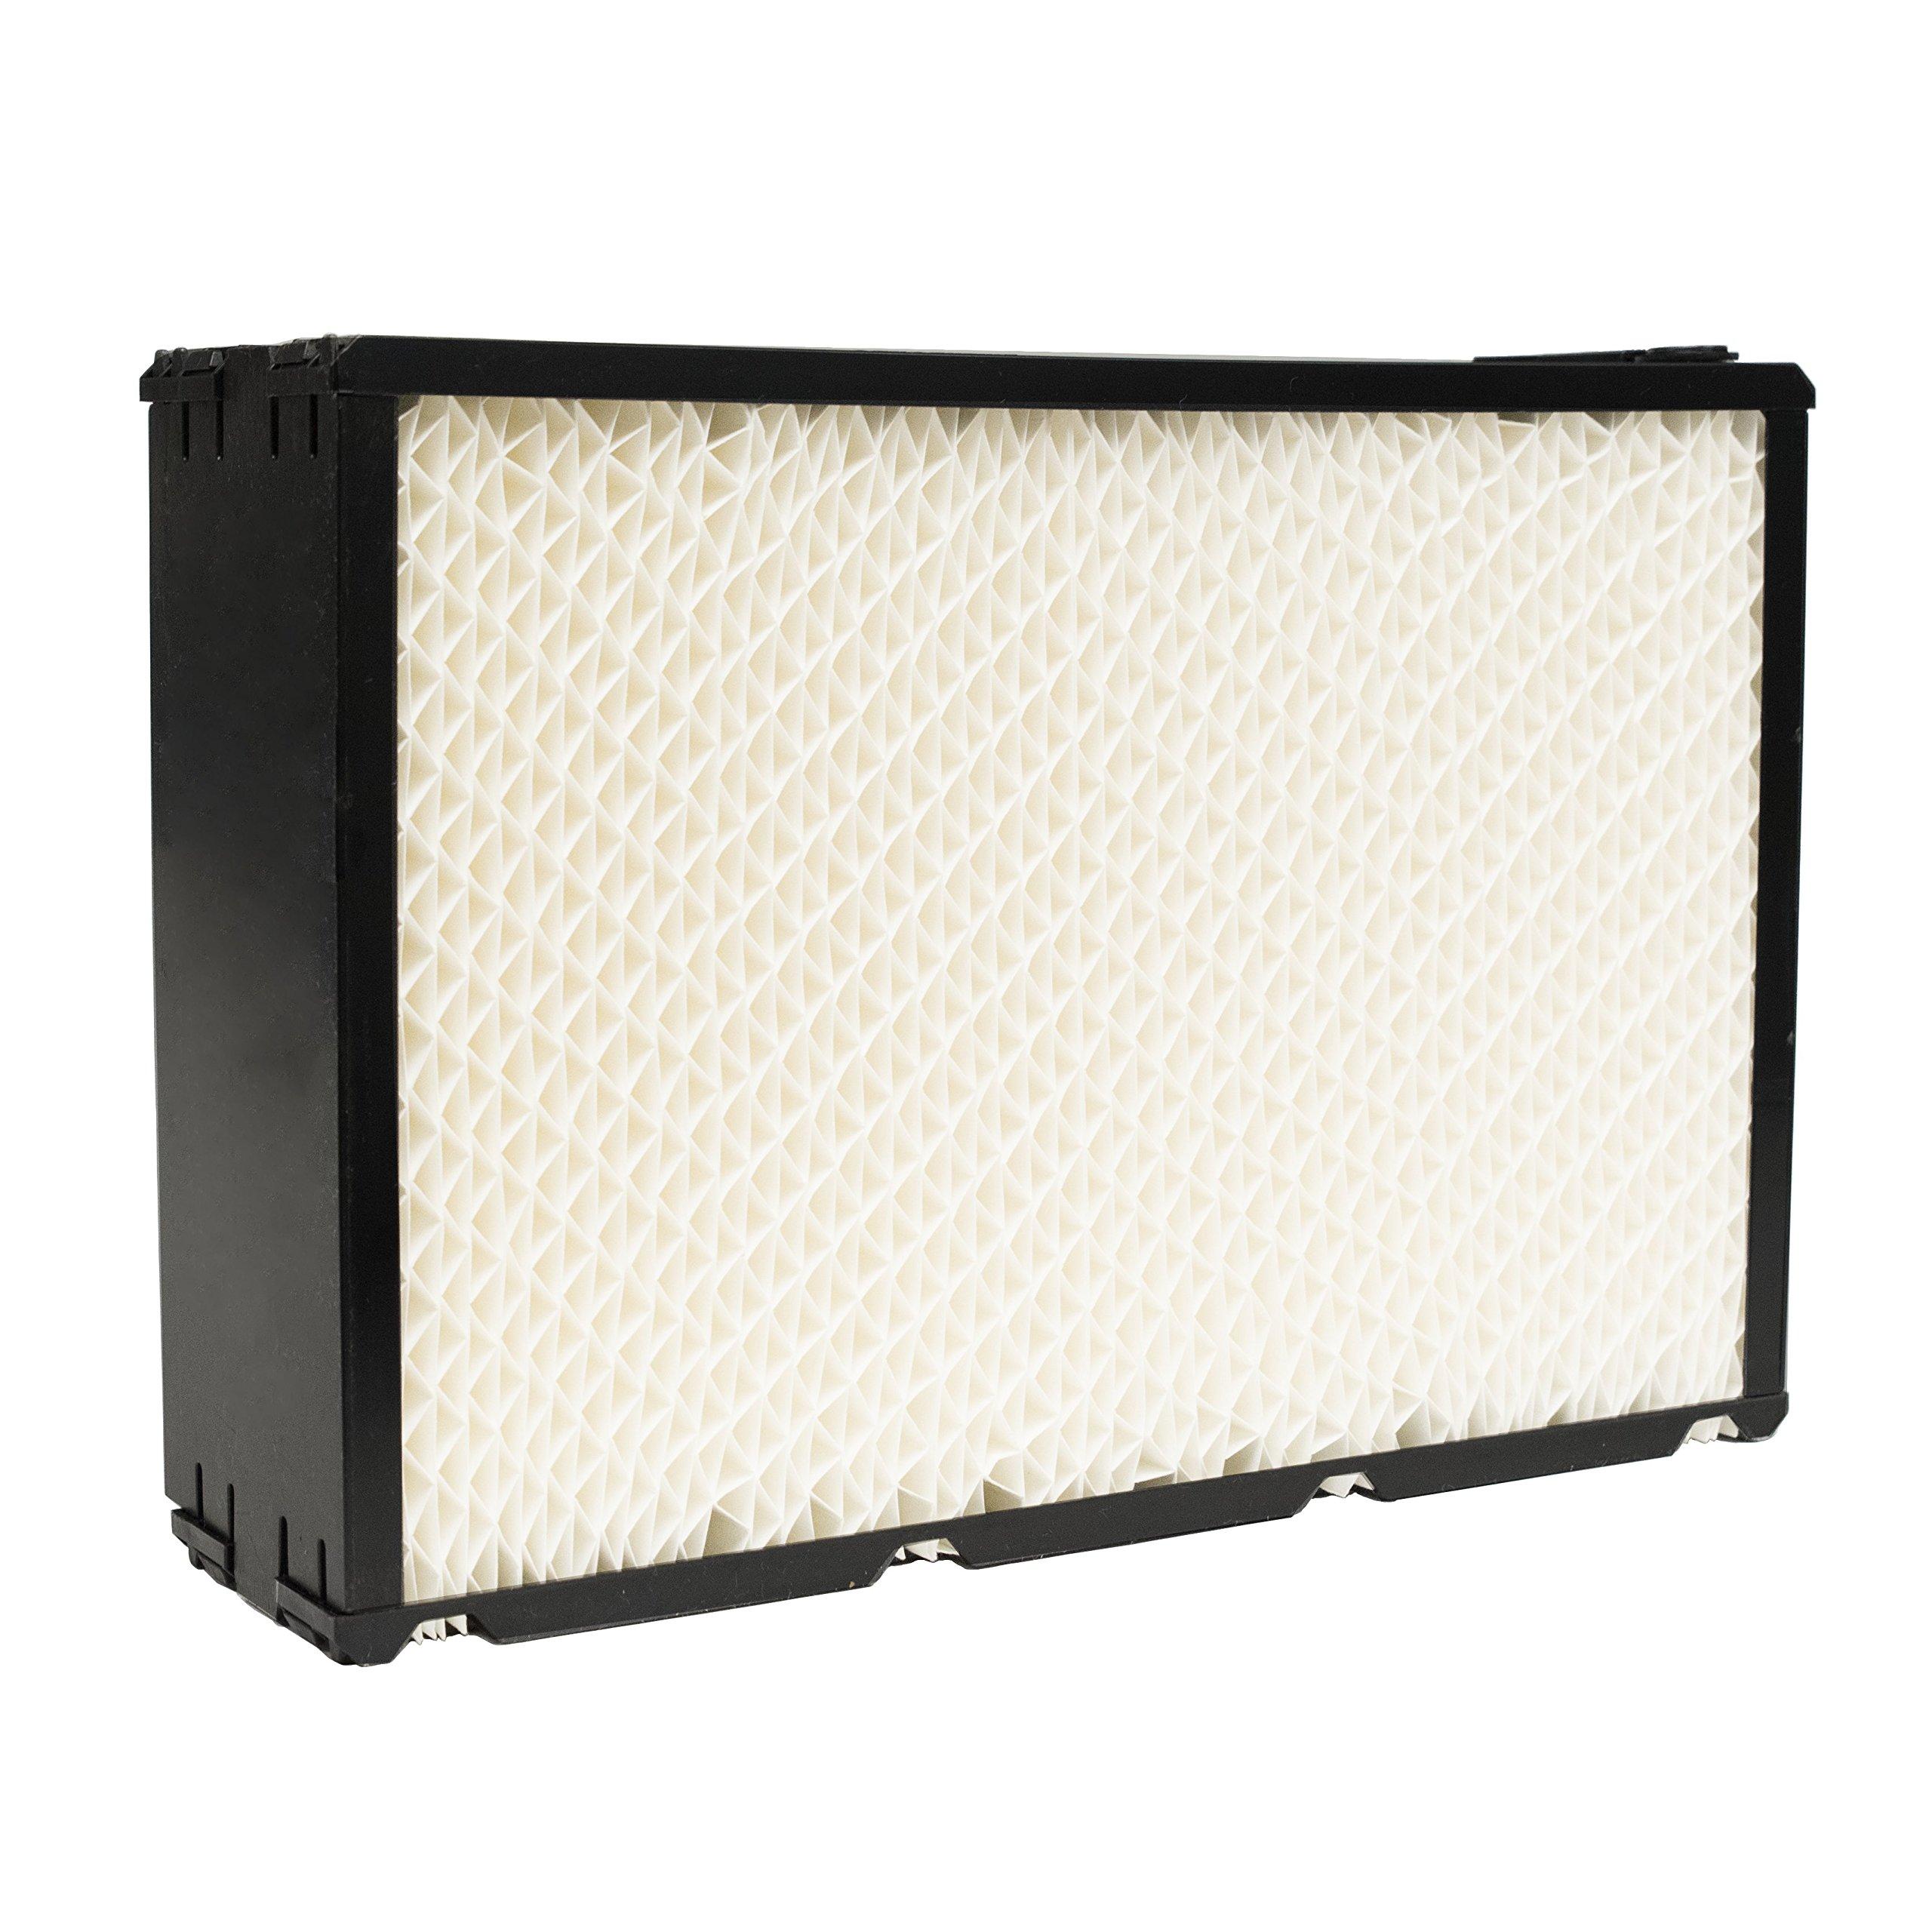 Essick Air # 1045 Humidifier Super Wick Evaporative Filter - Quantity 7